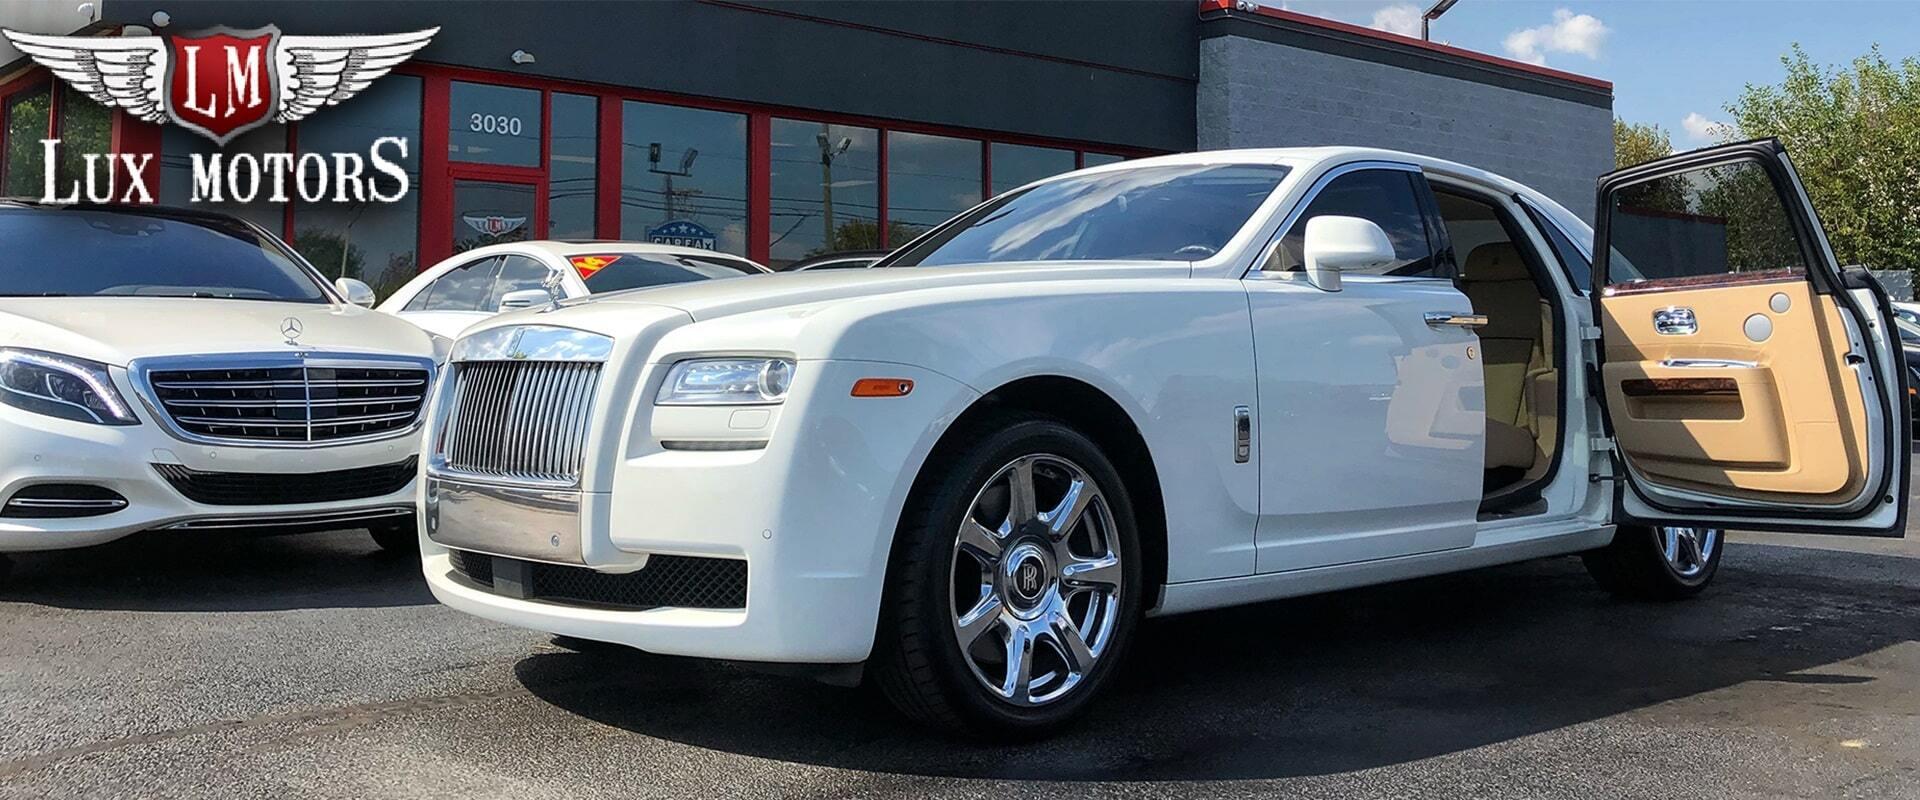 Used Cars Evansville In >> Used Vehicle Dealership Evansville In Lux Motors